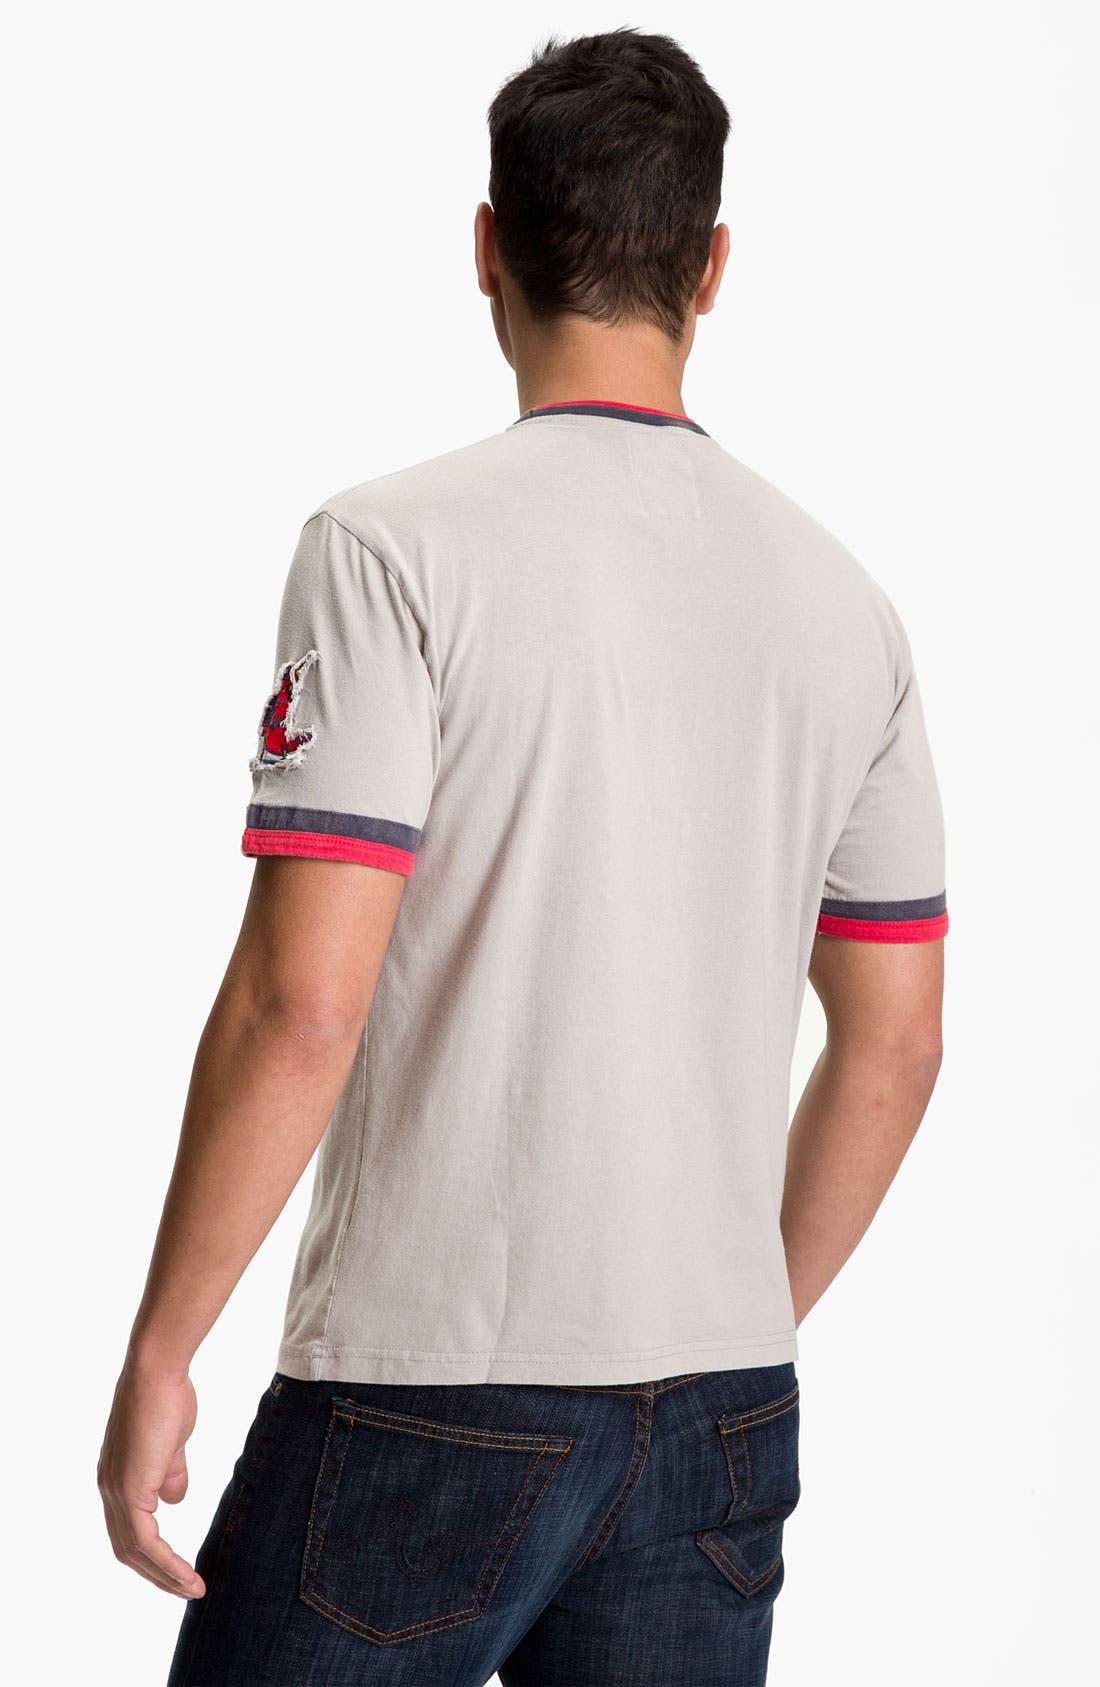 Alternate Image 3  - Red Jacket 'Cincinnati Reds' Trim Fit Crewneck Ringer T-Shirt (Men)